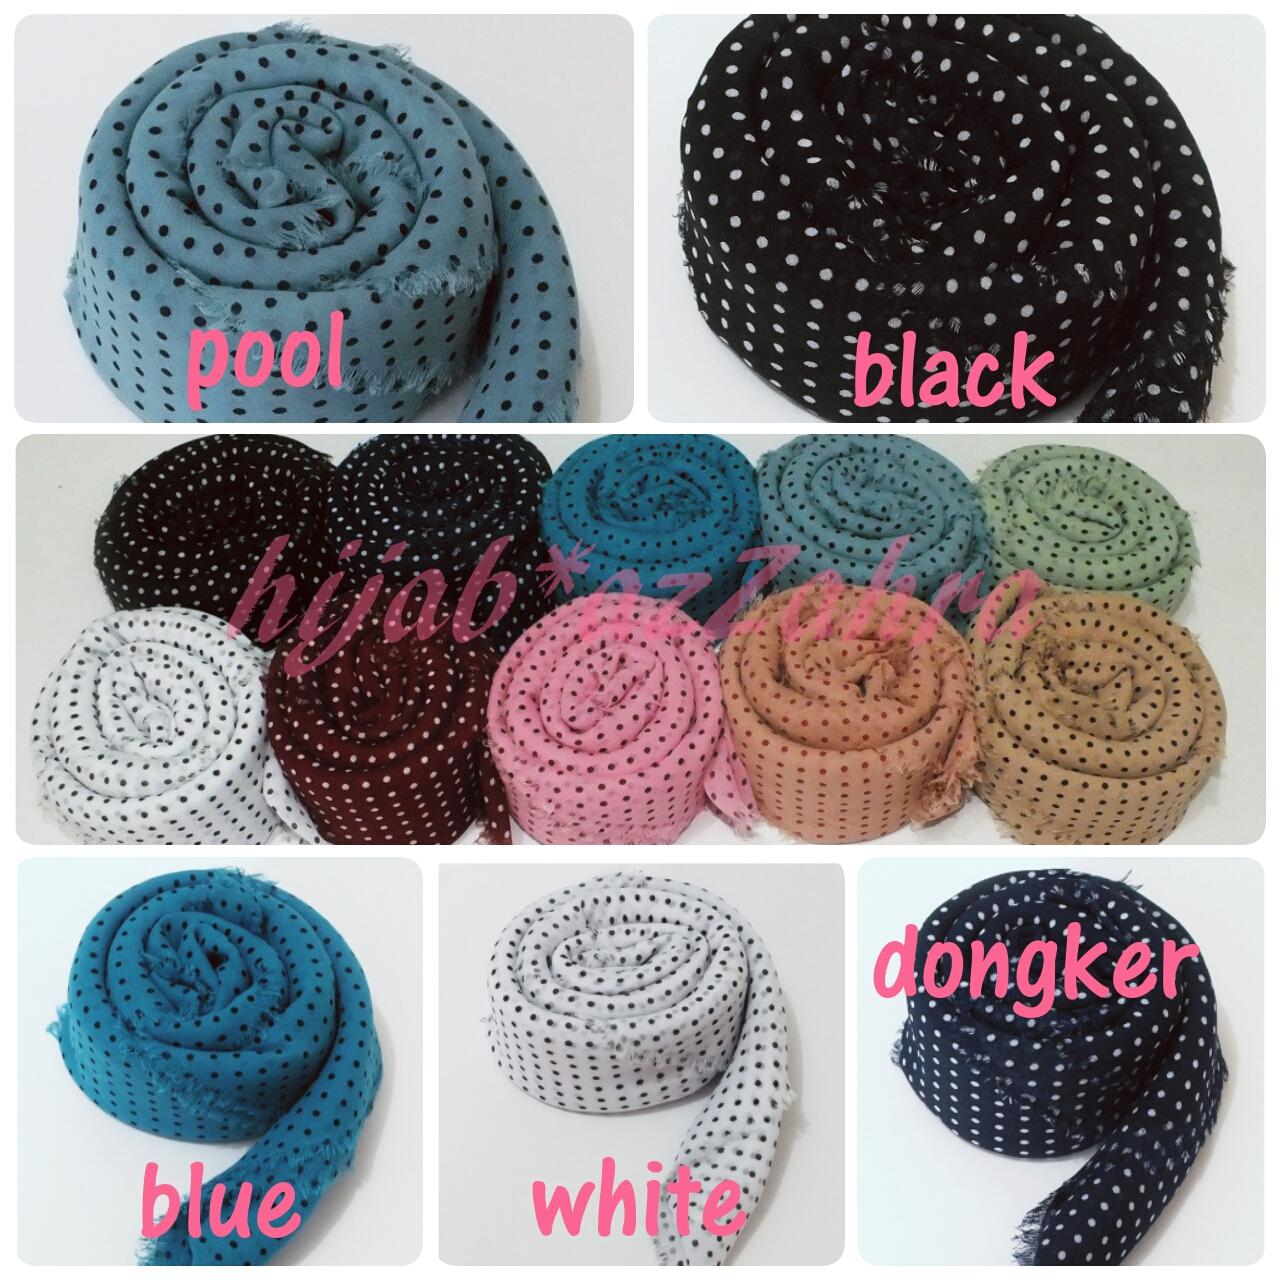 Jilbab segiempat sifon motif polka / hijab / termurah / supplier